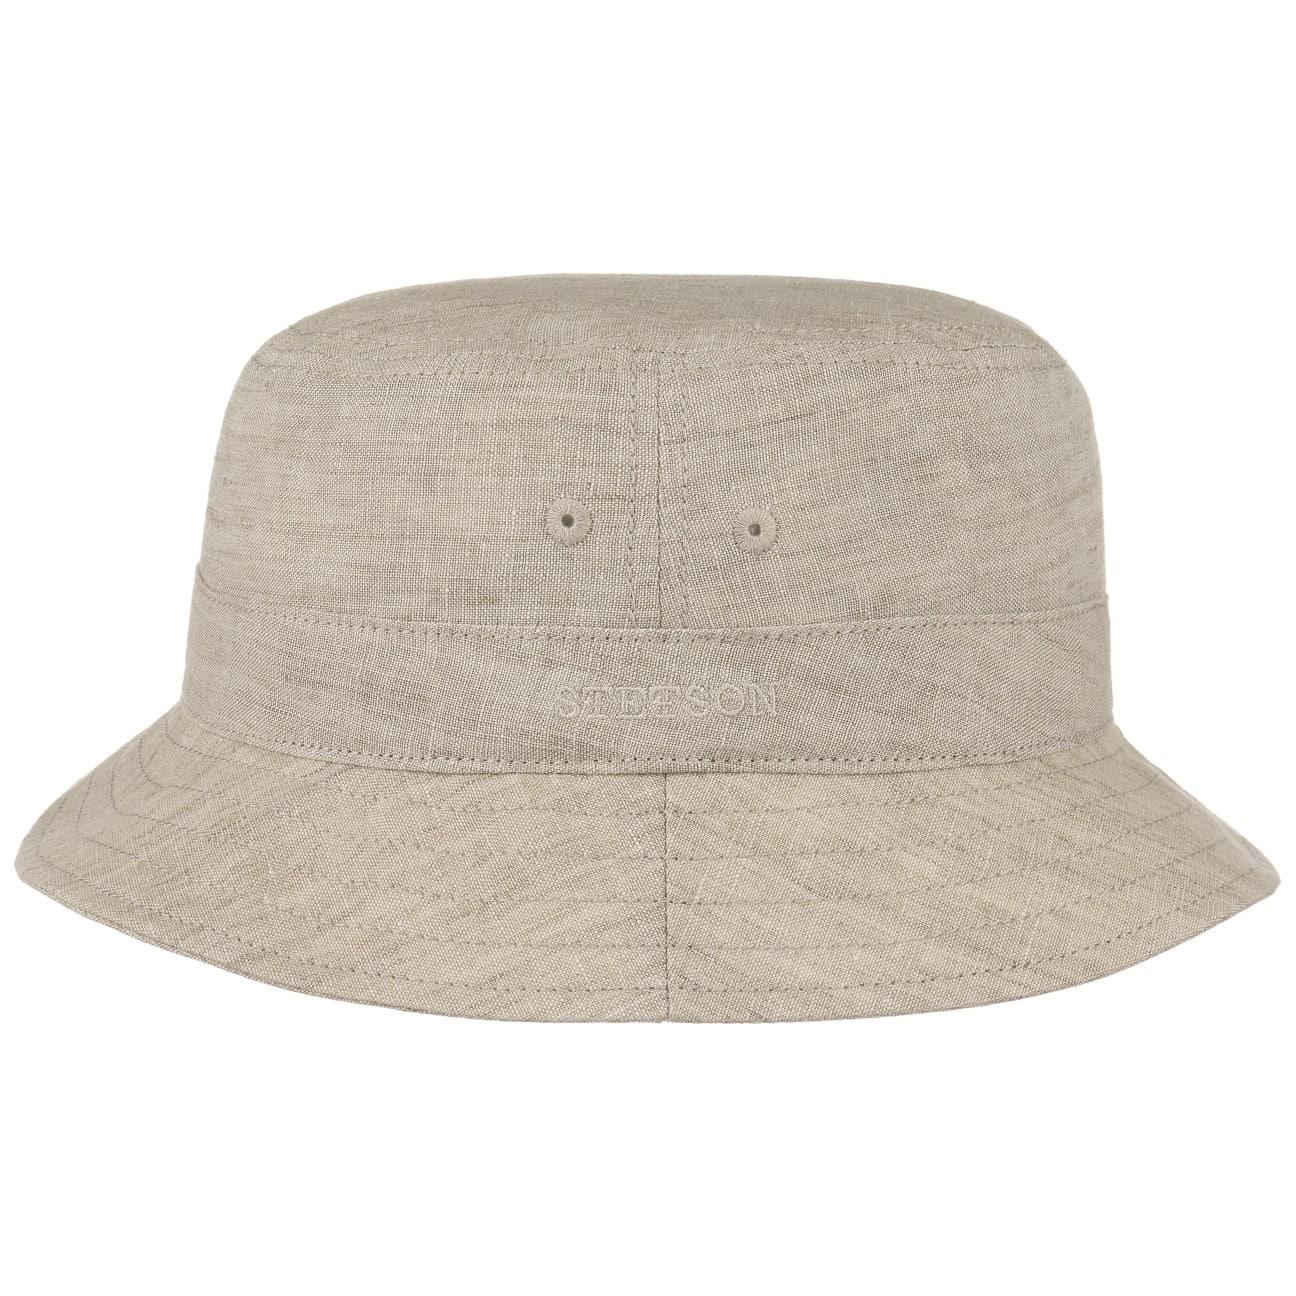 ... Ros Linen Bucket Hat by Stetson - beige 4 ... 3895c681401